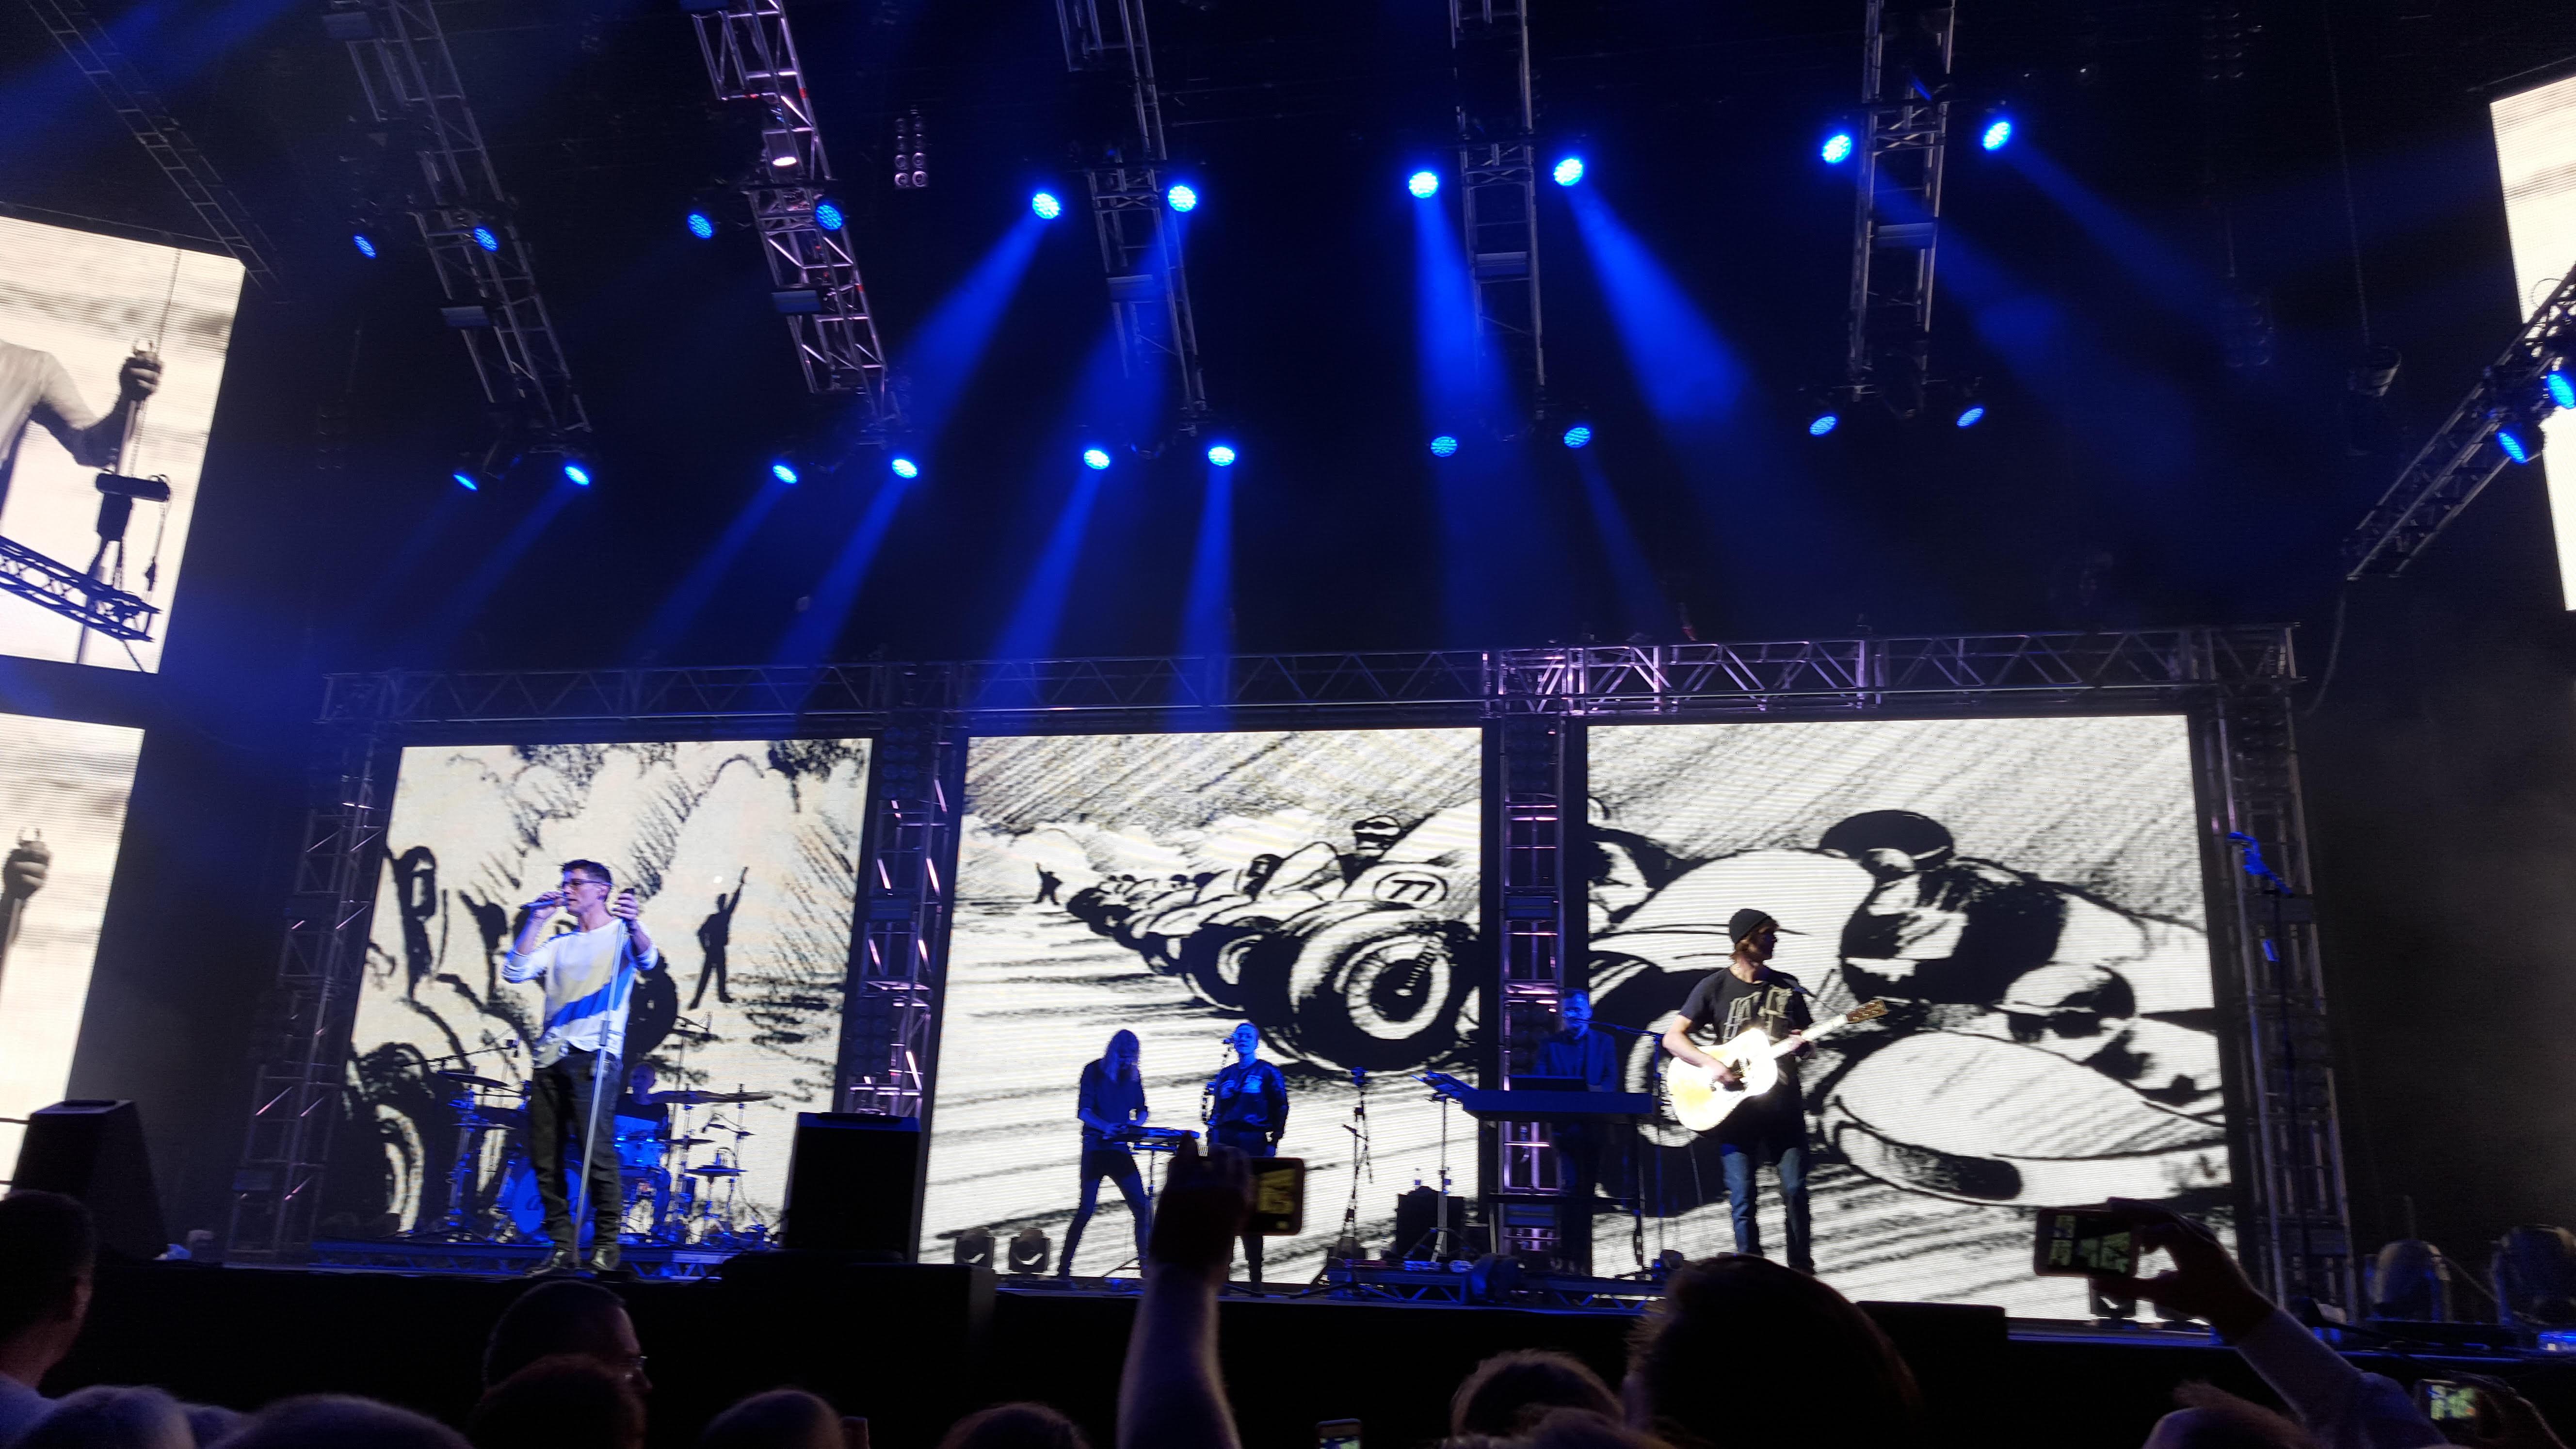 a-ha - Take On Me performance at Oslo Spektrum